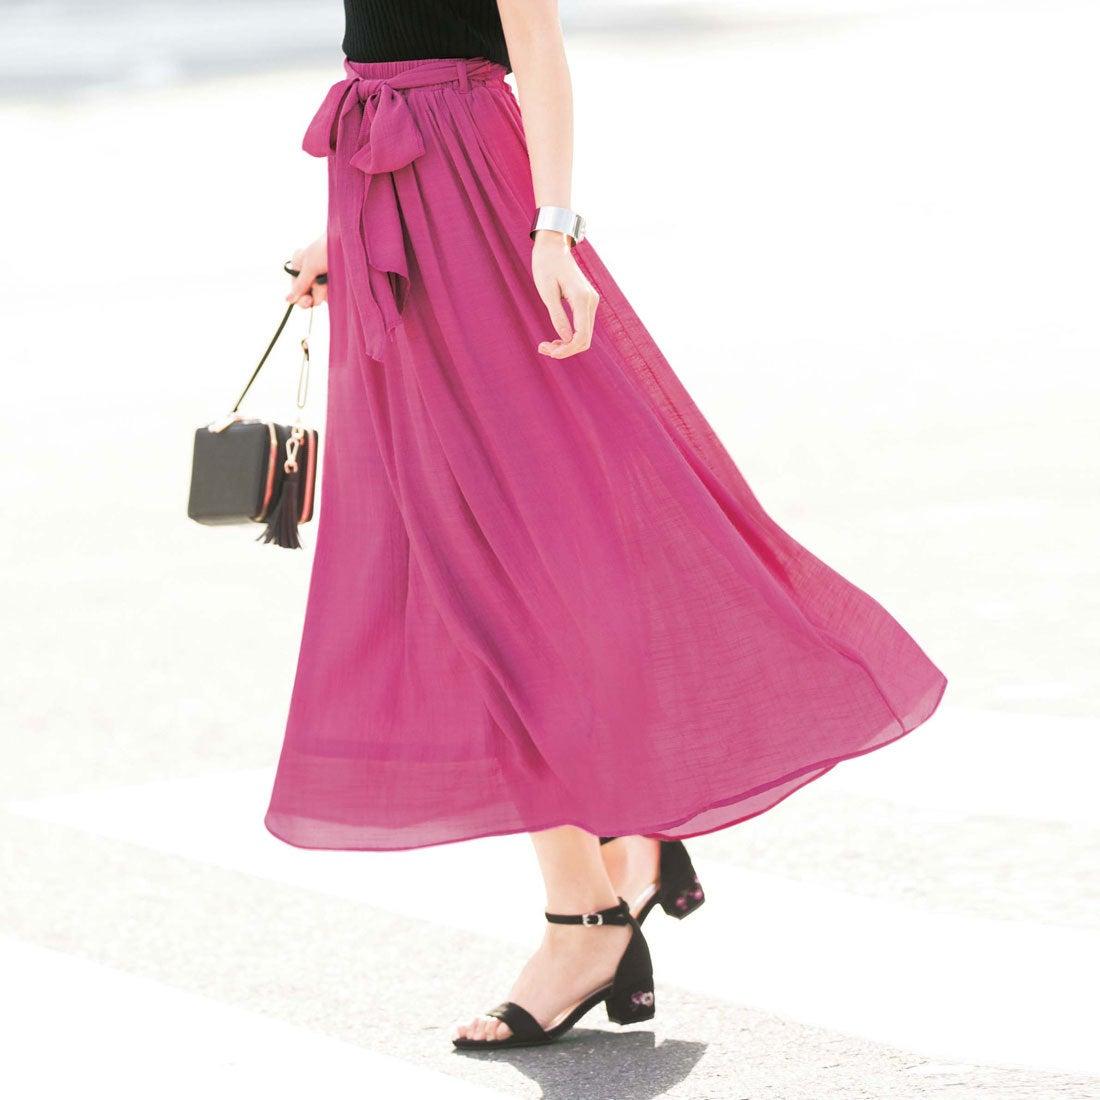 ff701ef2261e GeeRA ジーラ バイ リュリュ GeeRa by RyuRyu 楽チン!さらっと涼やかマキシスカート (ピンク) -靴&ファッション通販  ロコンド〜自宅で試着、気軽に返品